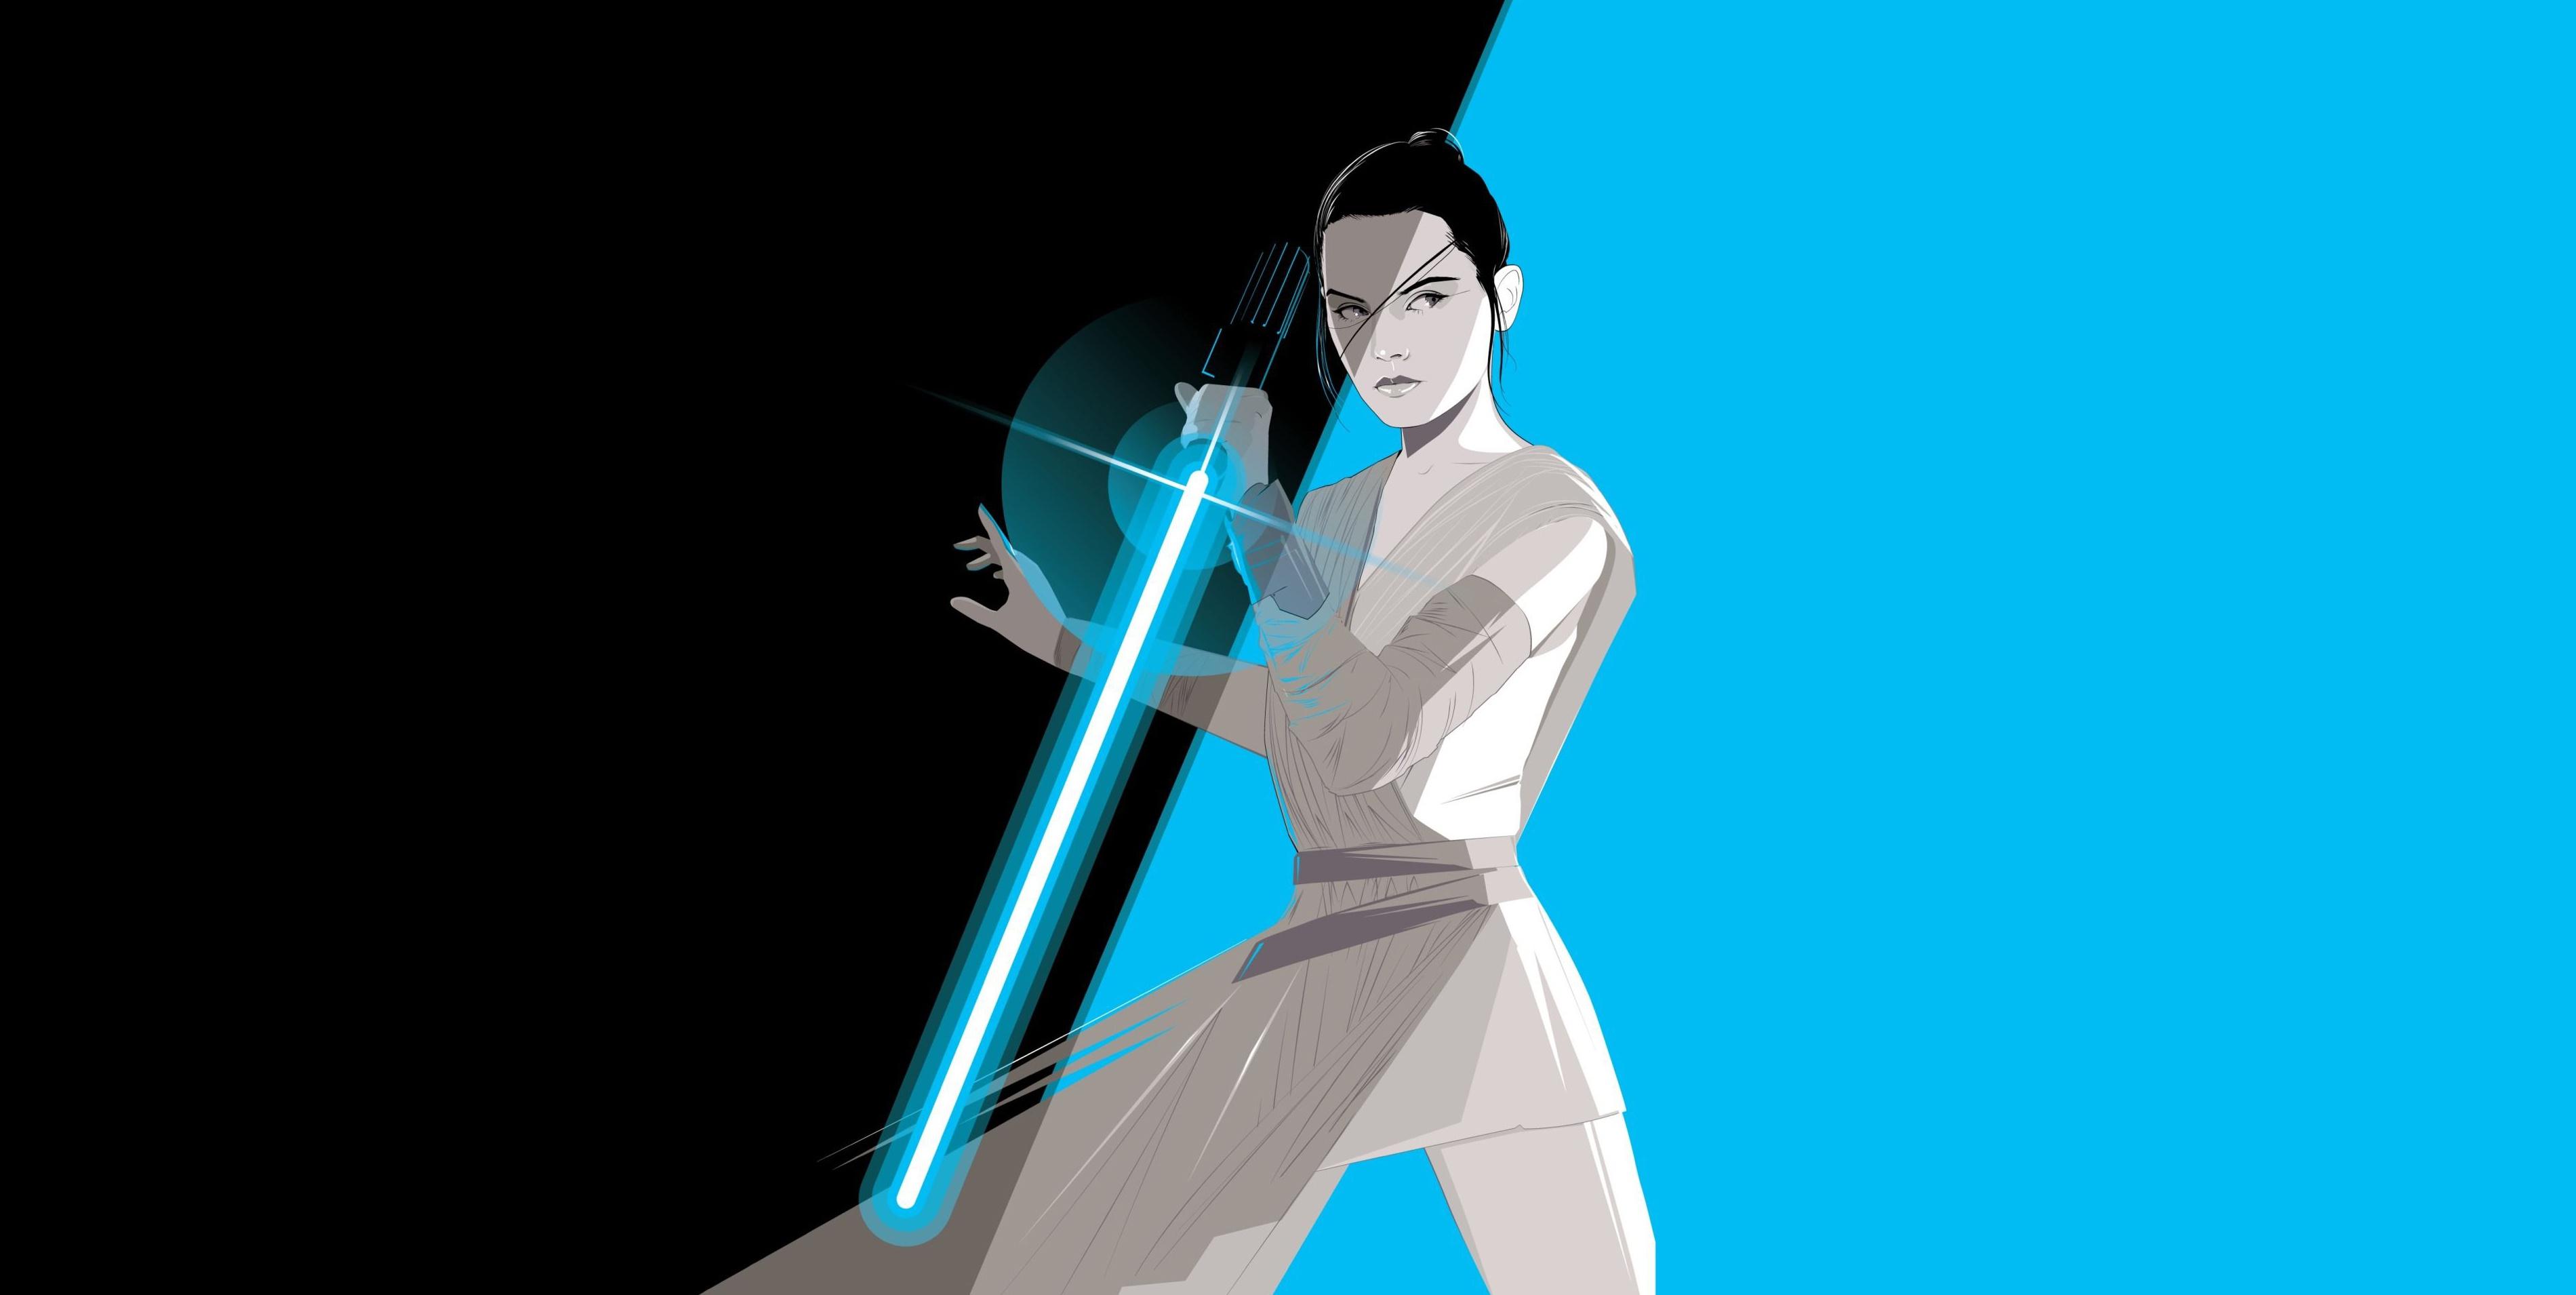 Rey Star Wars Lightsaber Simple Cyan 3800x1910